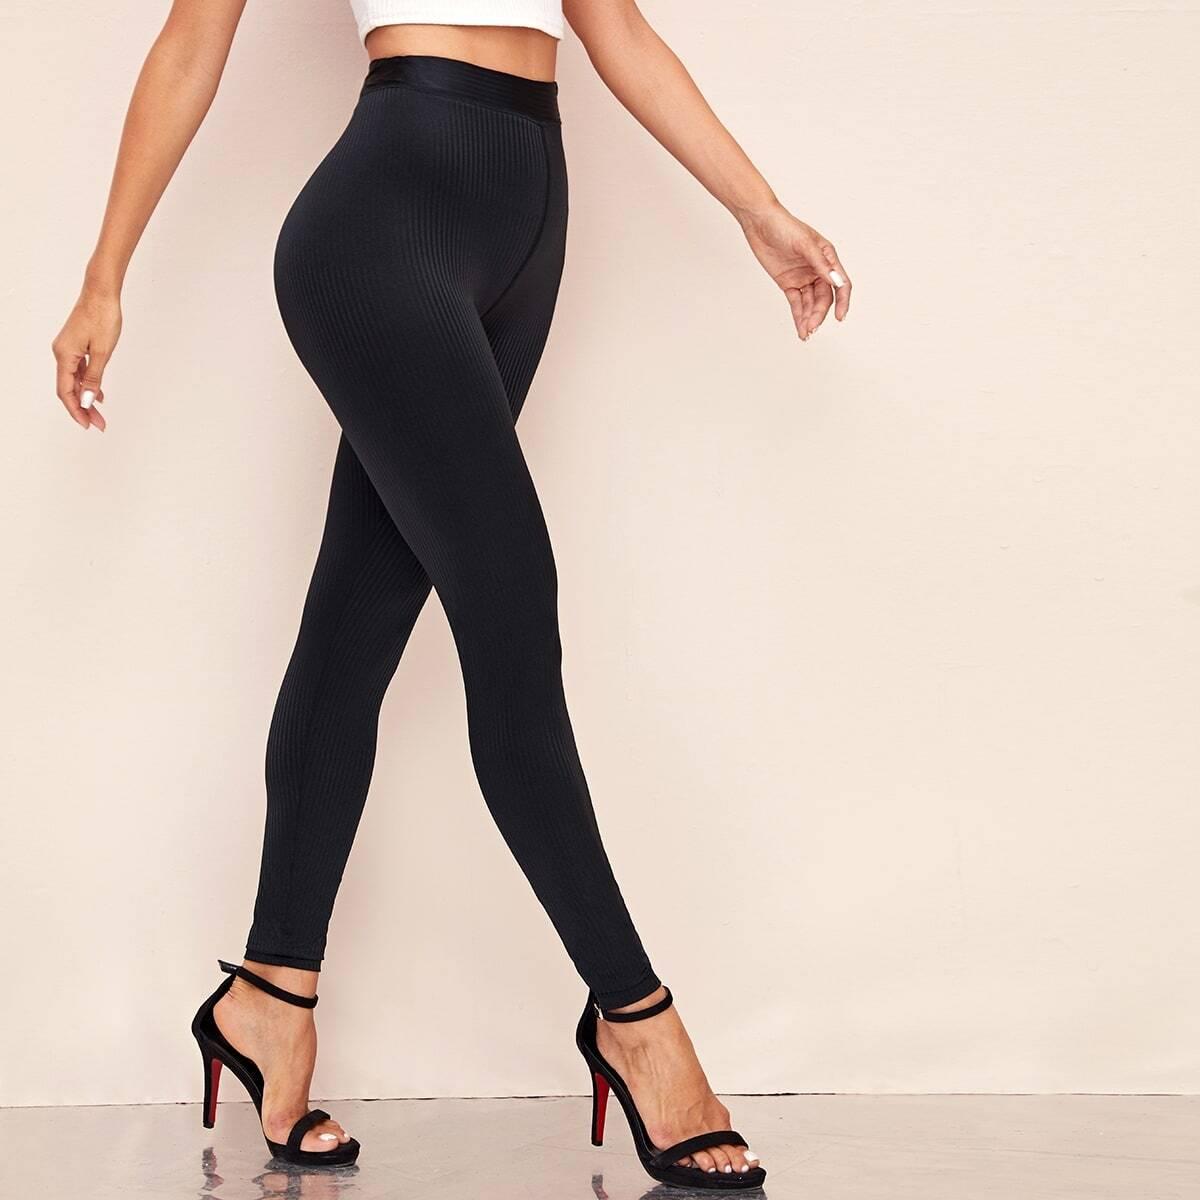 SHEIN / Strick Leggings mit hoher Taille